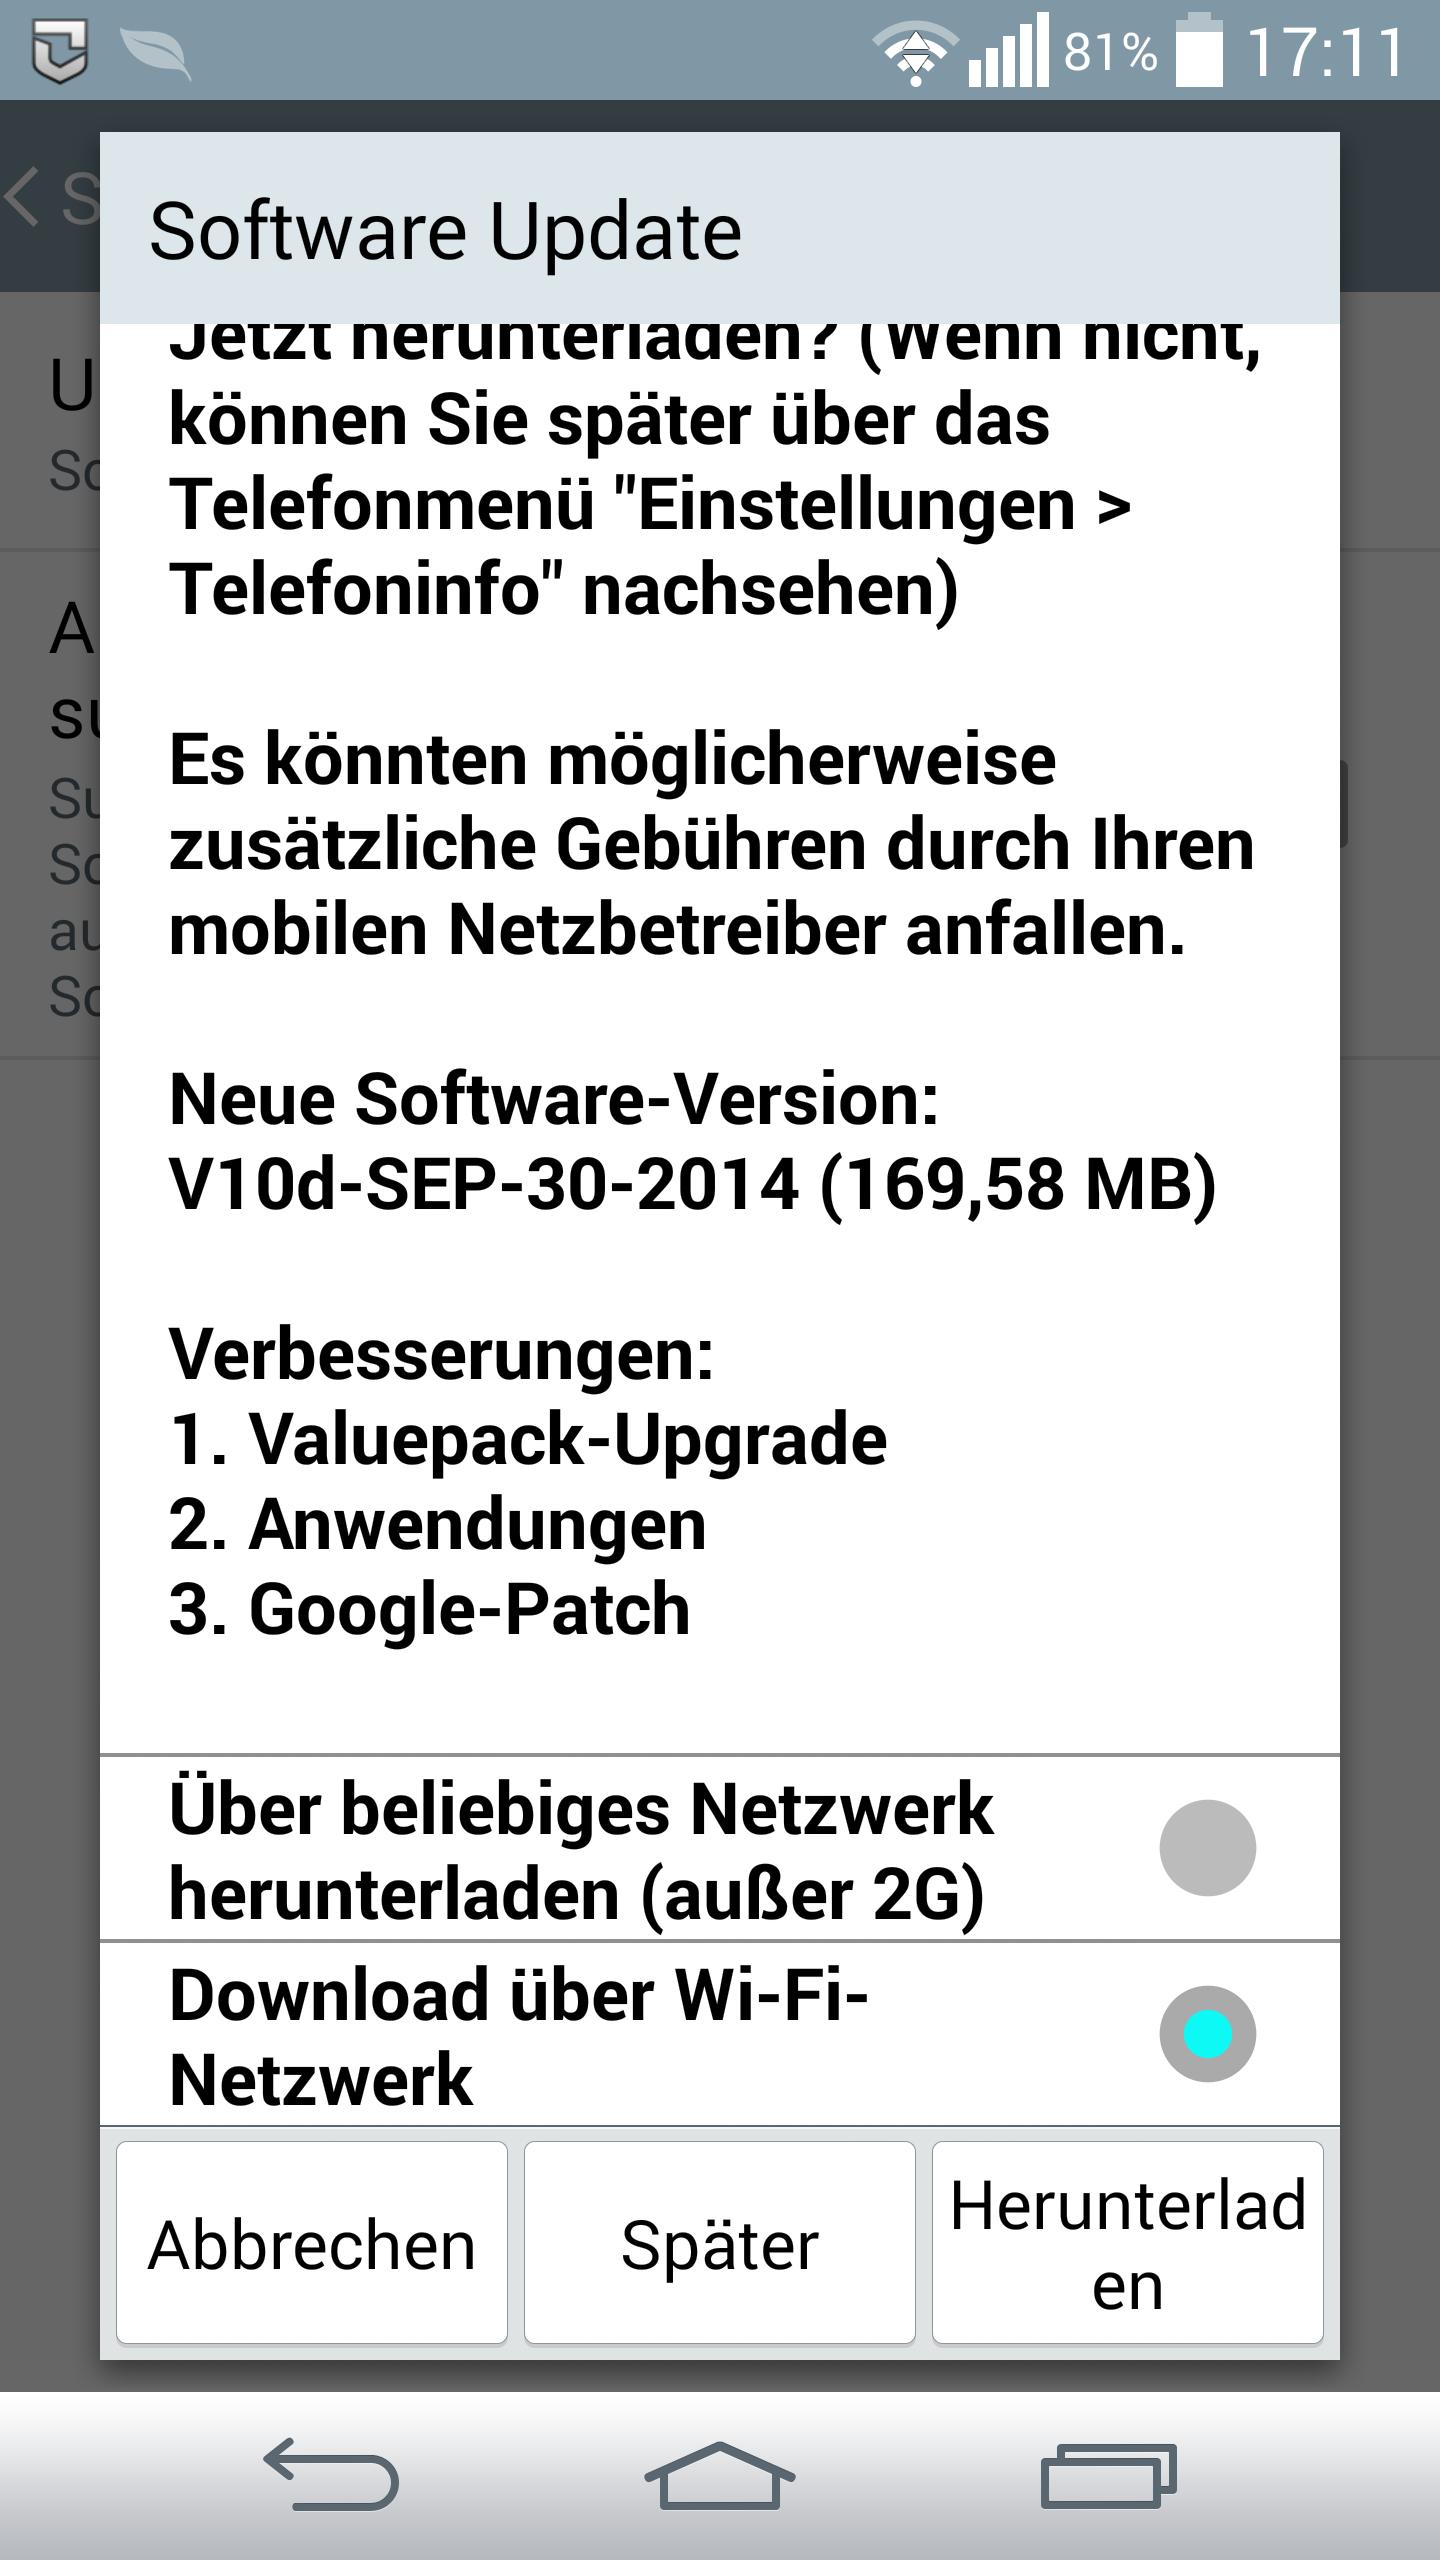 LG G3 mit Telekom-Branding erhält September-Update